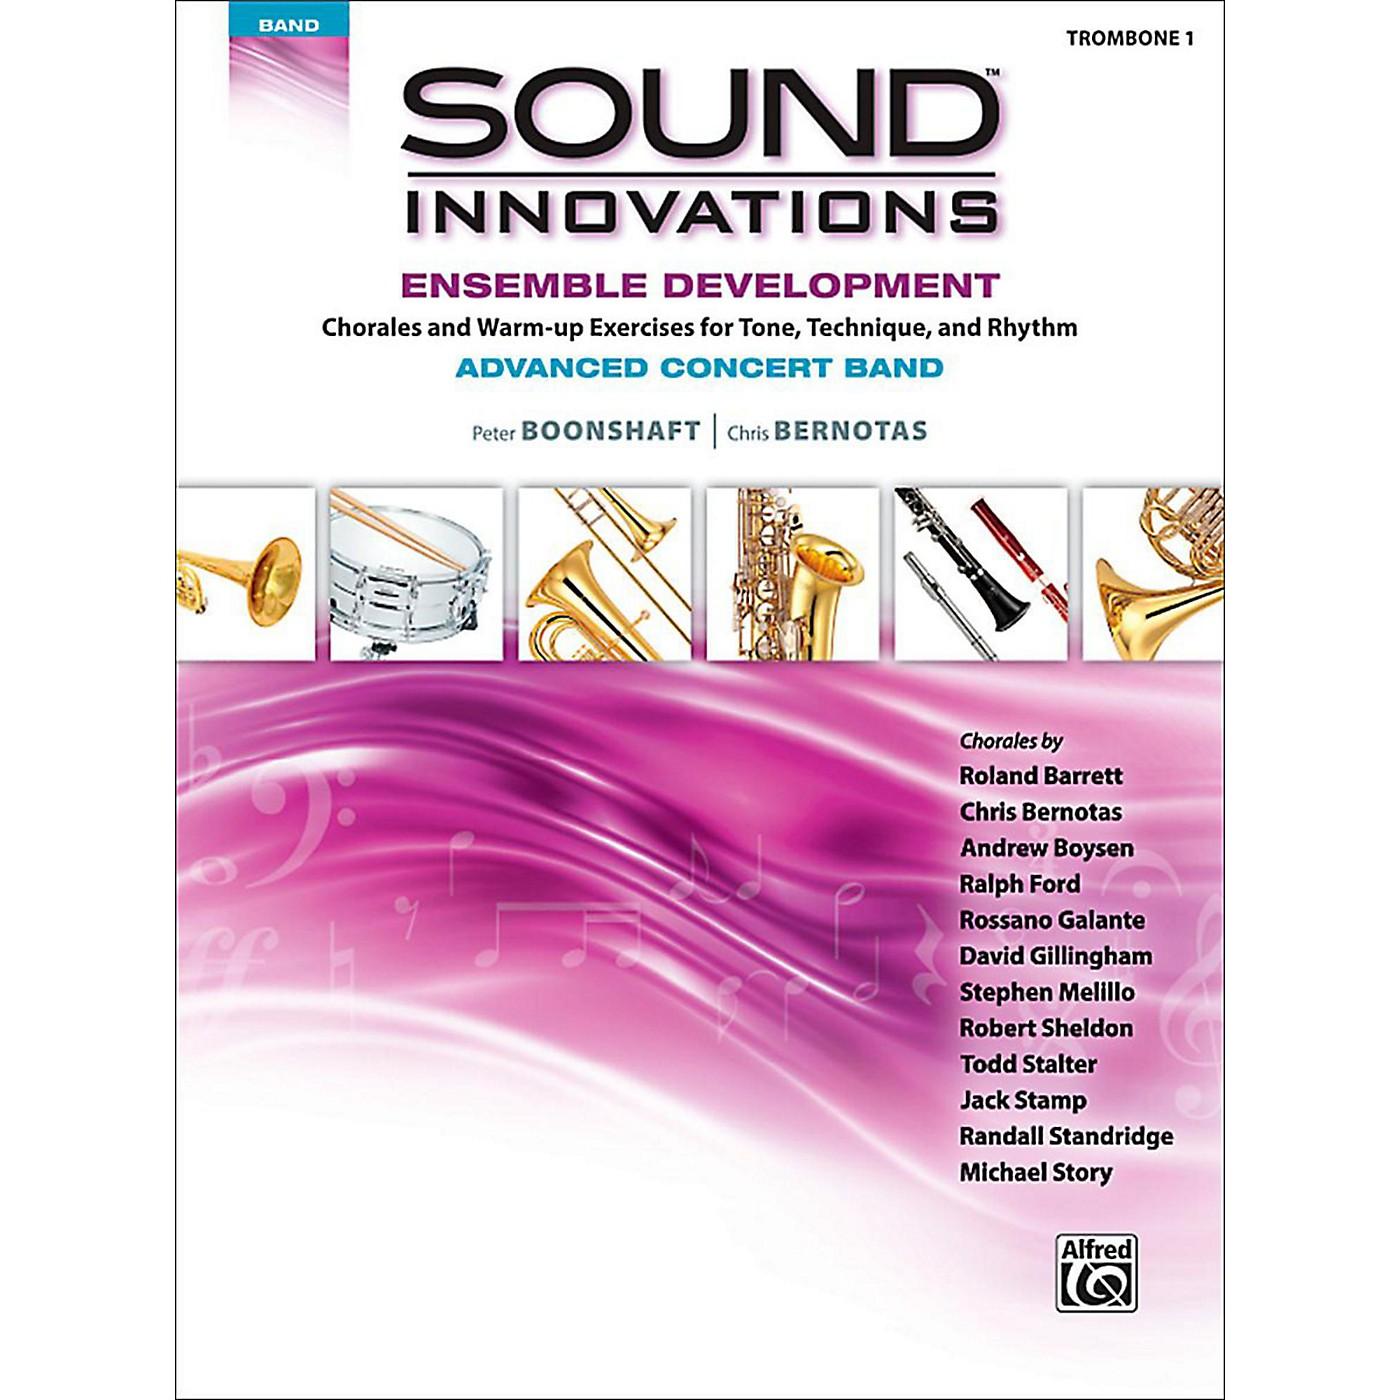 Alfred Sound Innovations Concert Band Ensemble Development Advanced Trombone 1 thumbnail